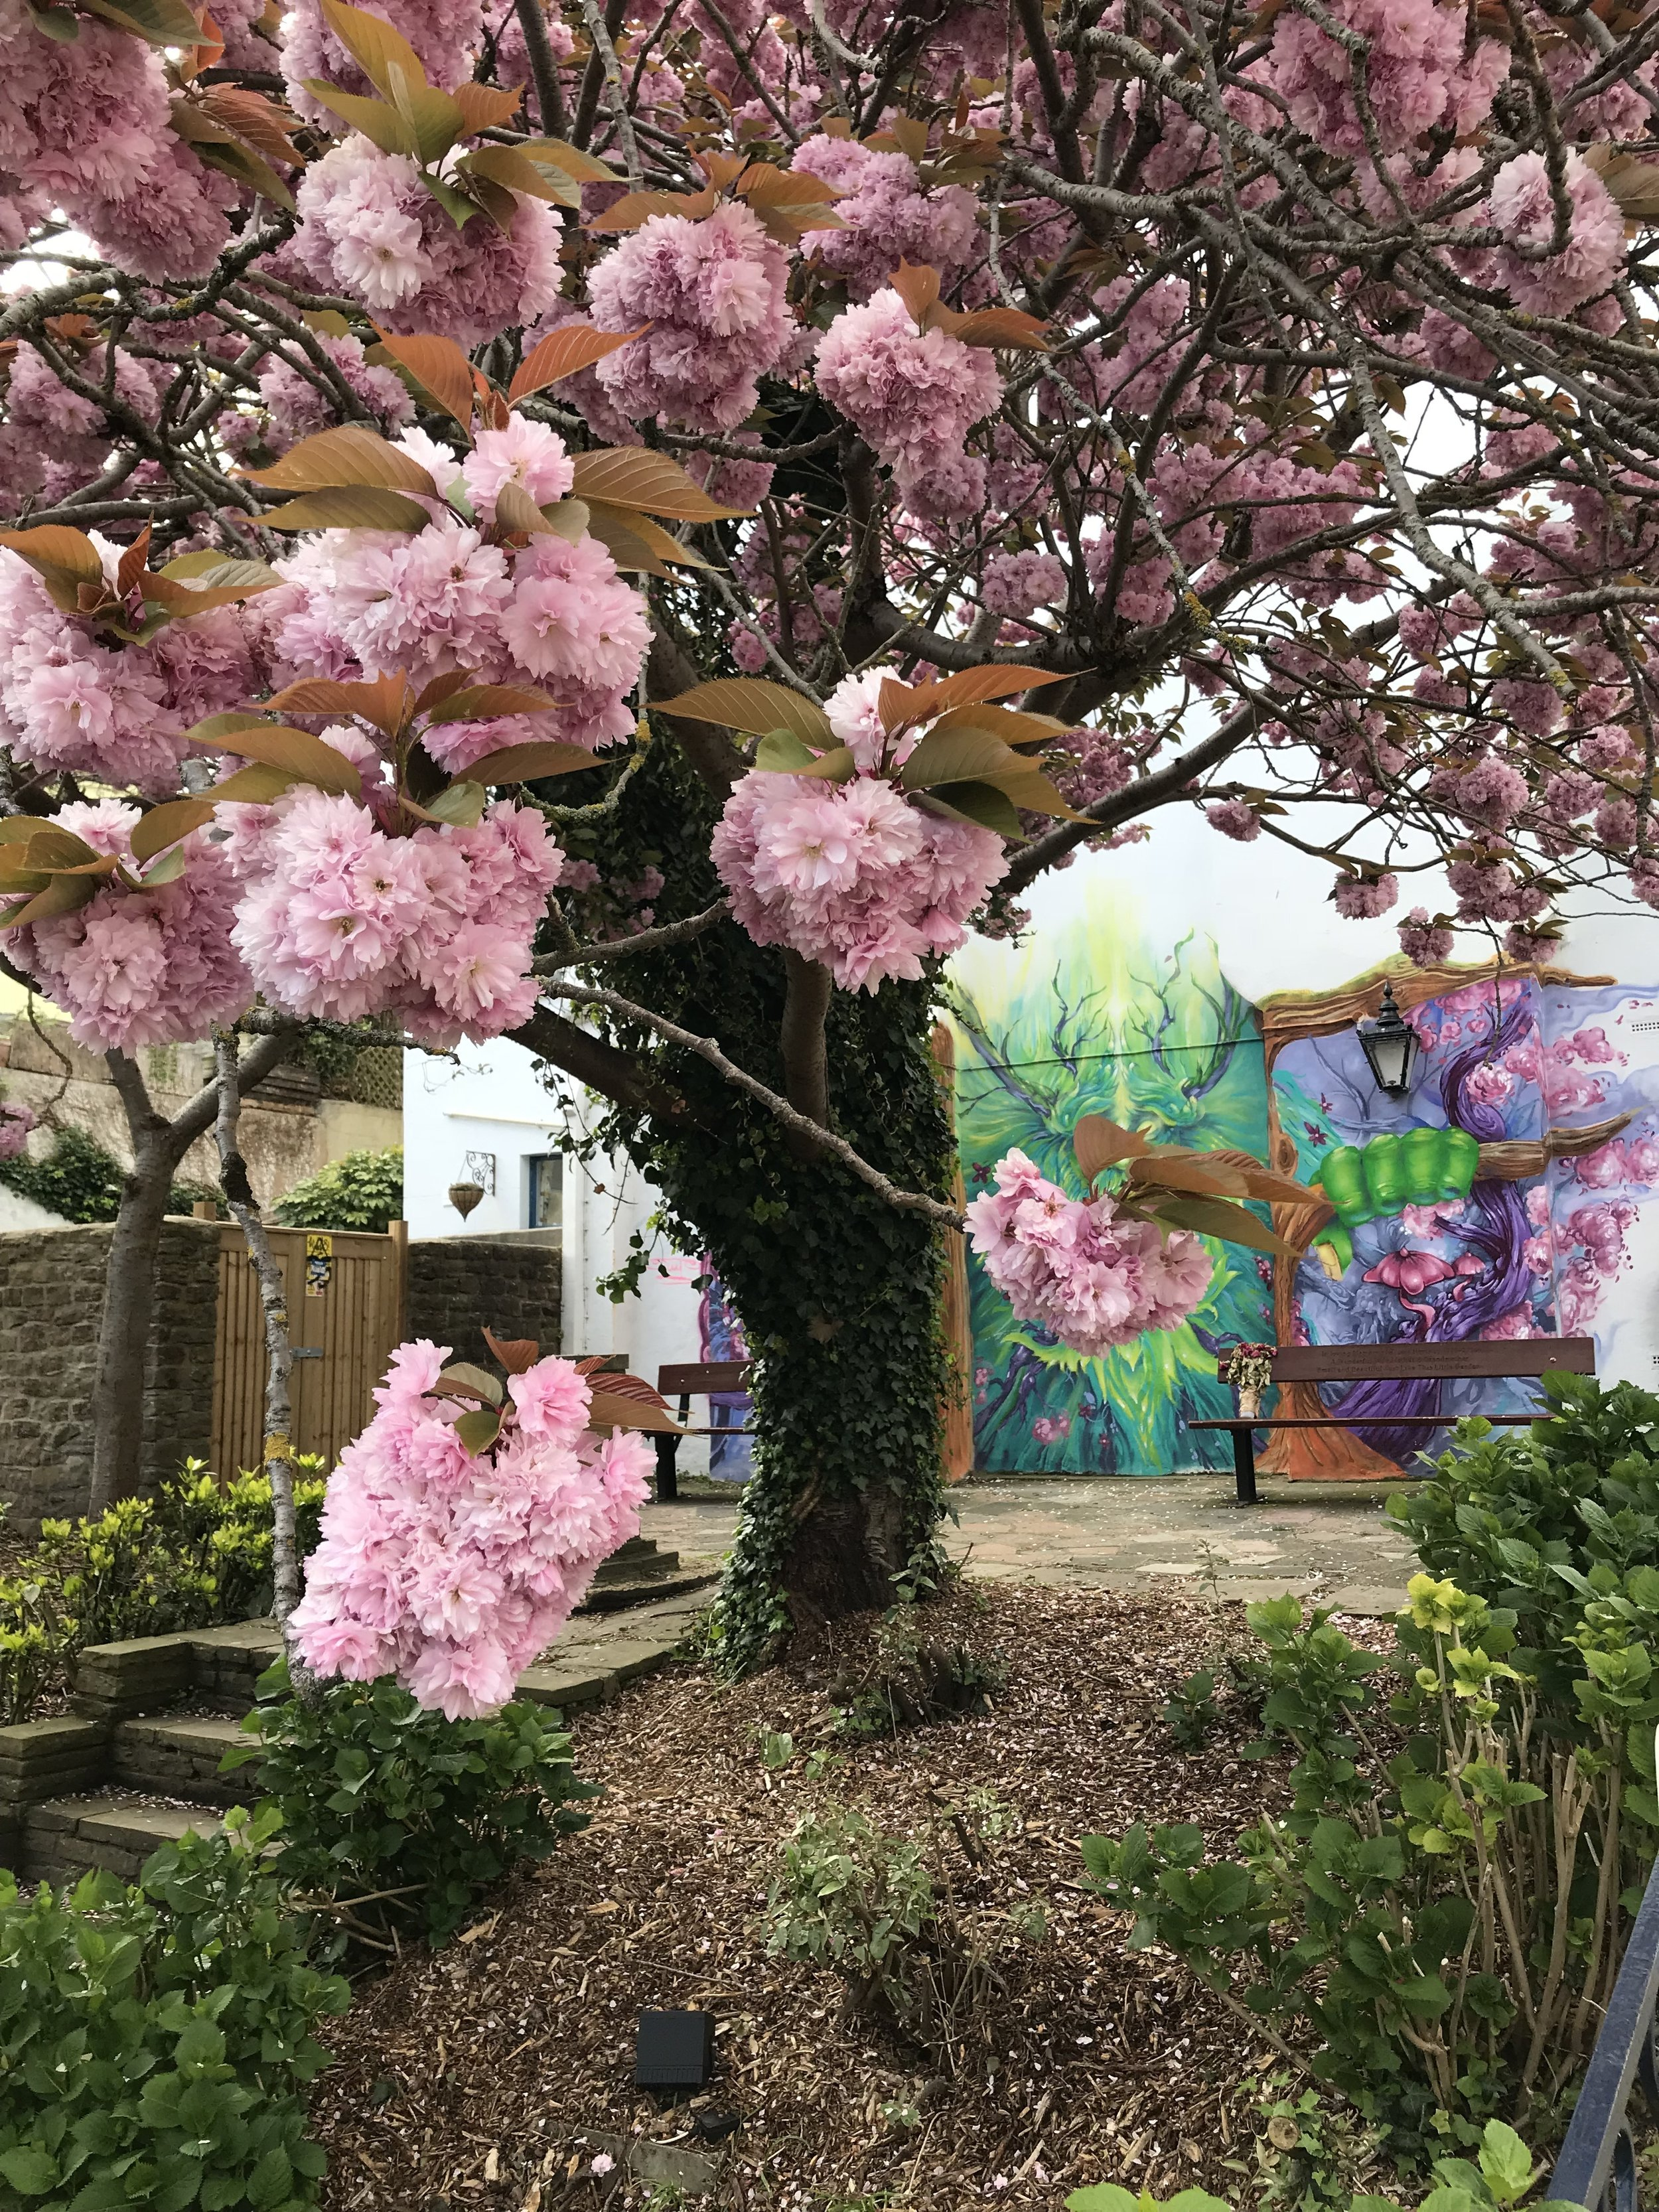 The blossom tree and memorial garden.